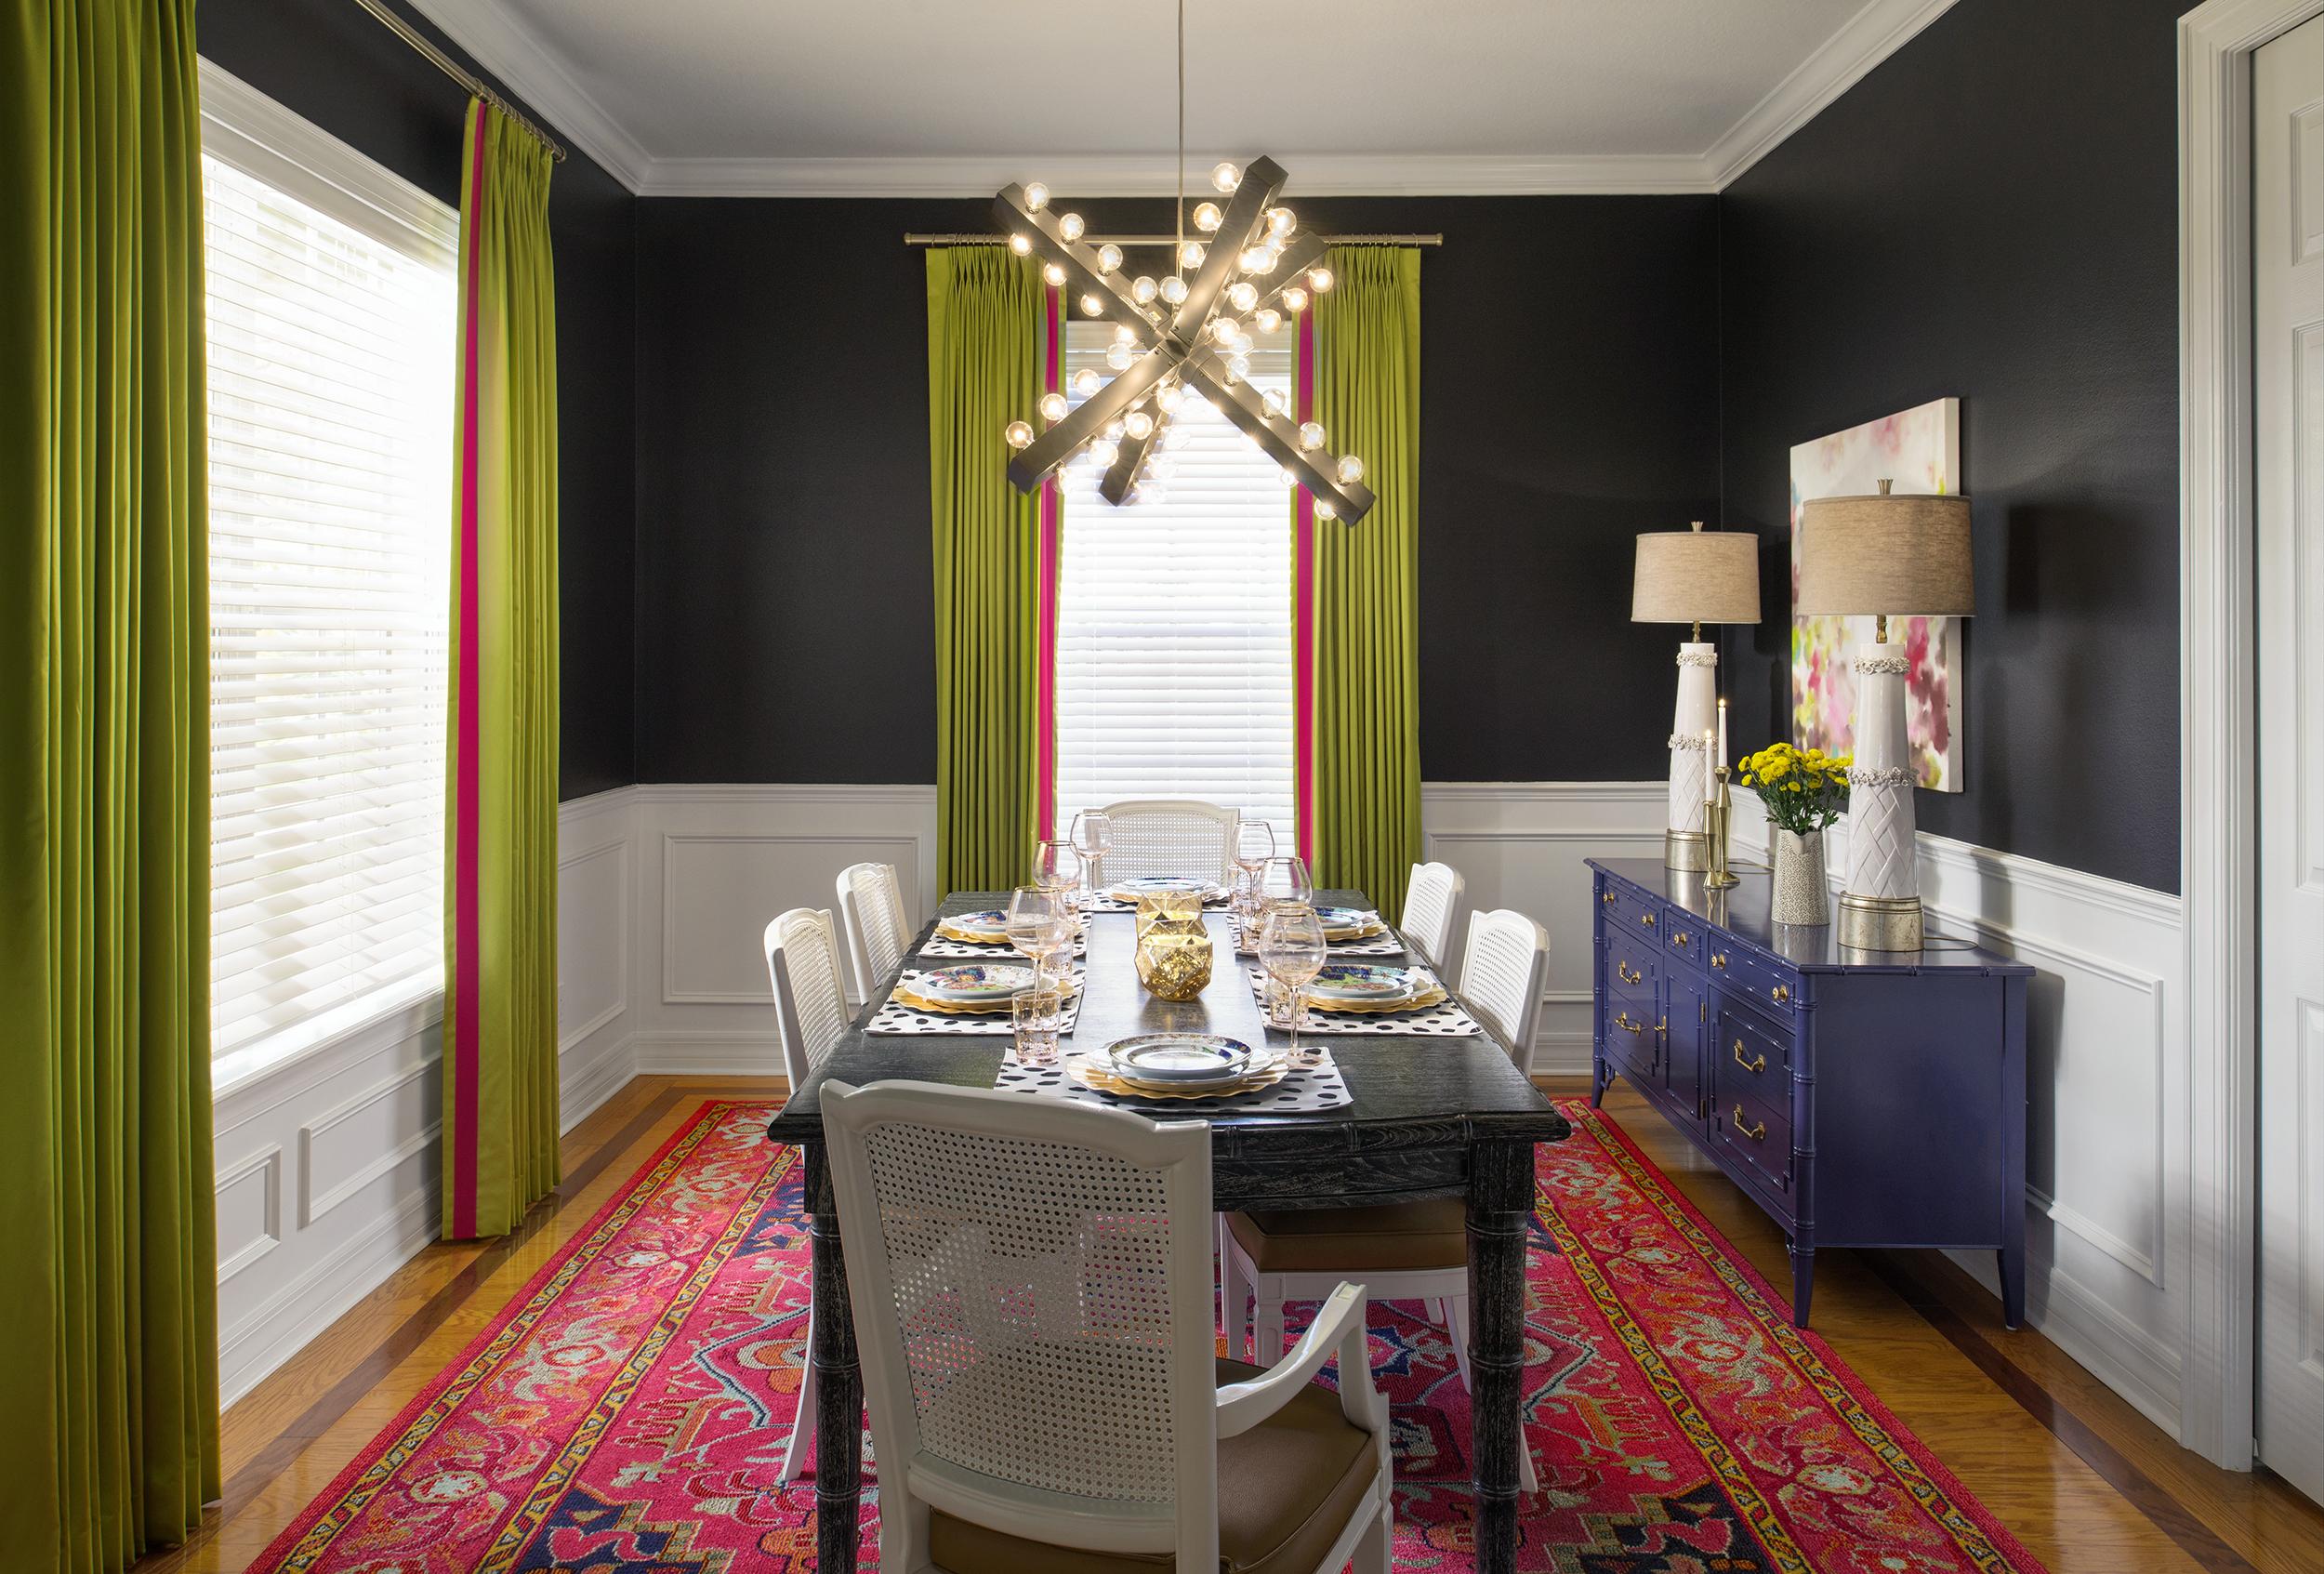 lisagilmoredesign_colorful_diningroom_1.jpg